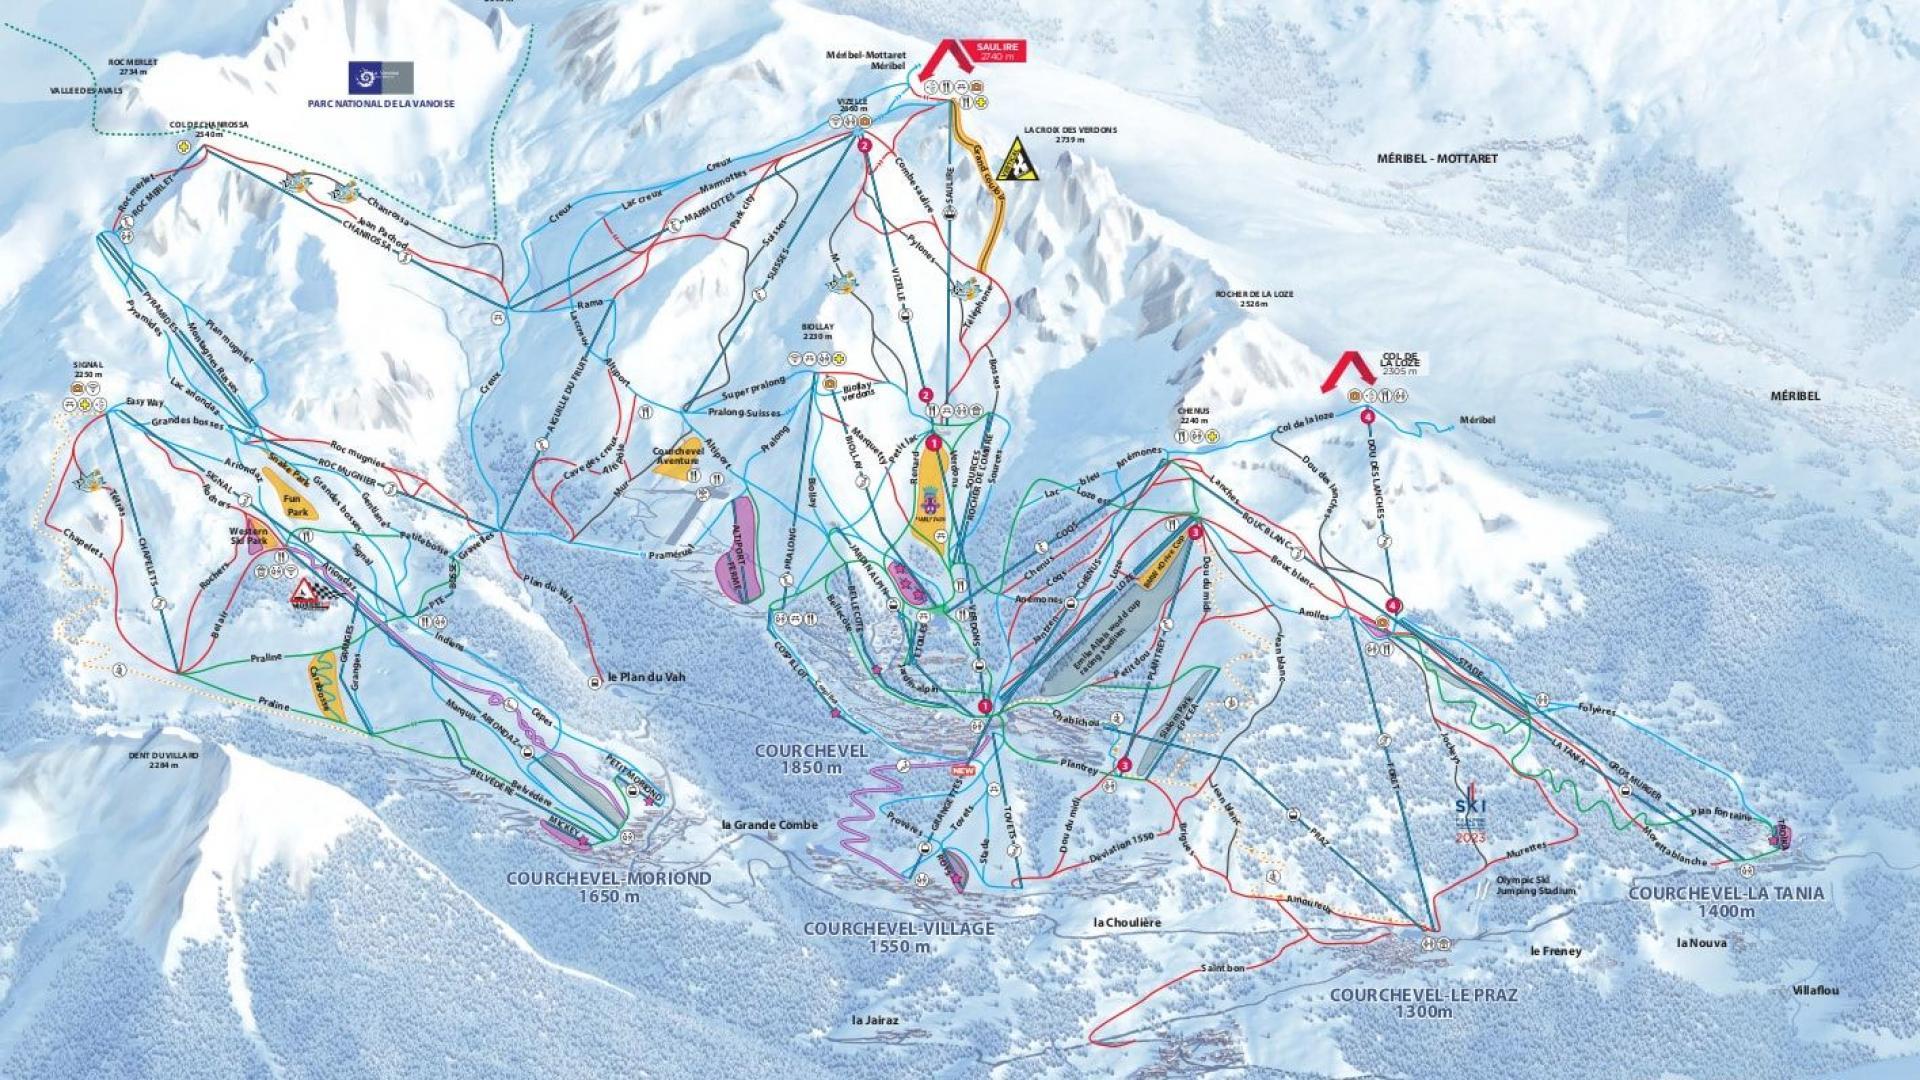 Luxury ski chalets to rent in Courchevel 1850